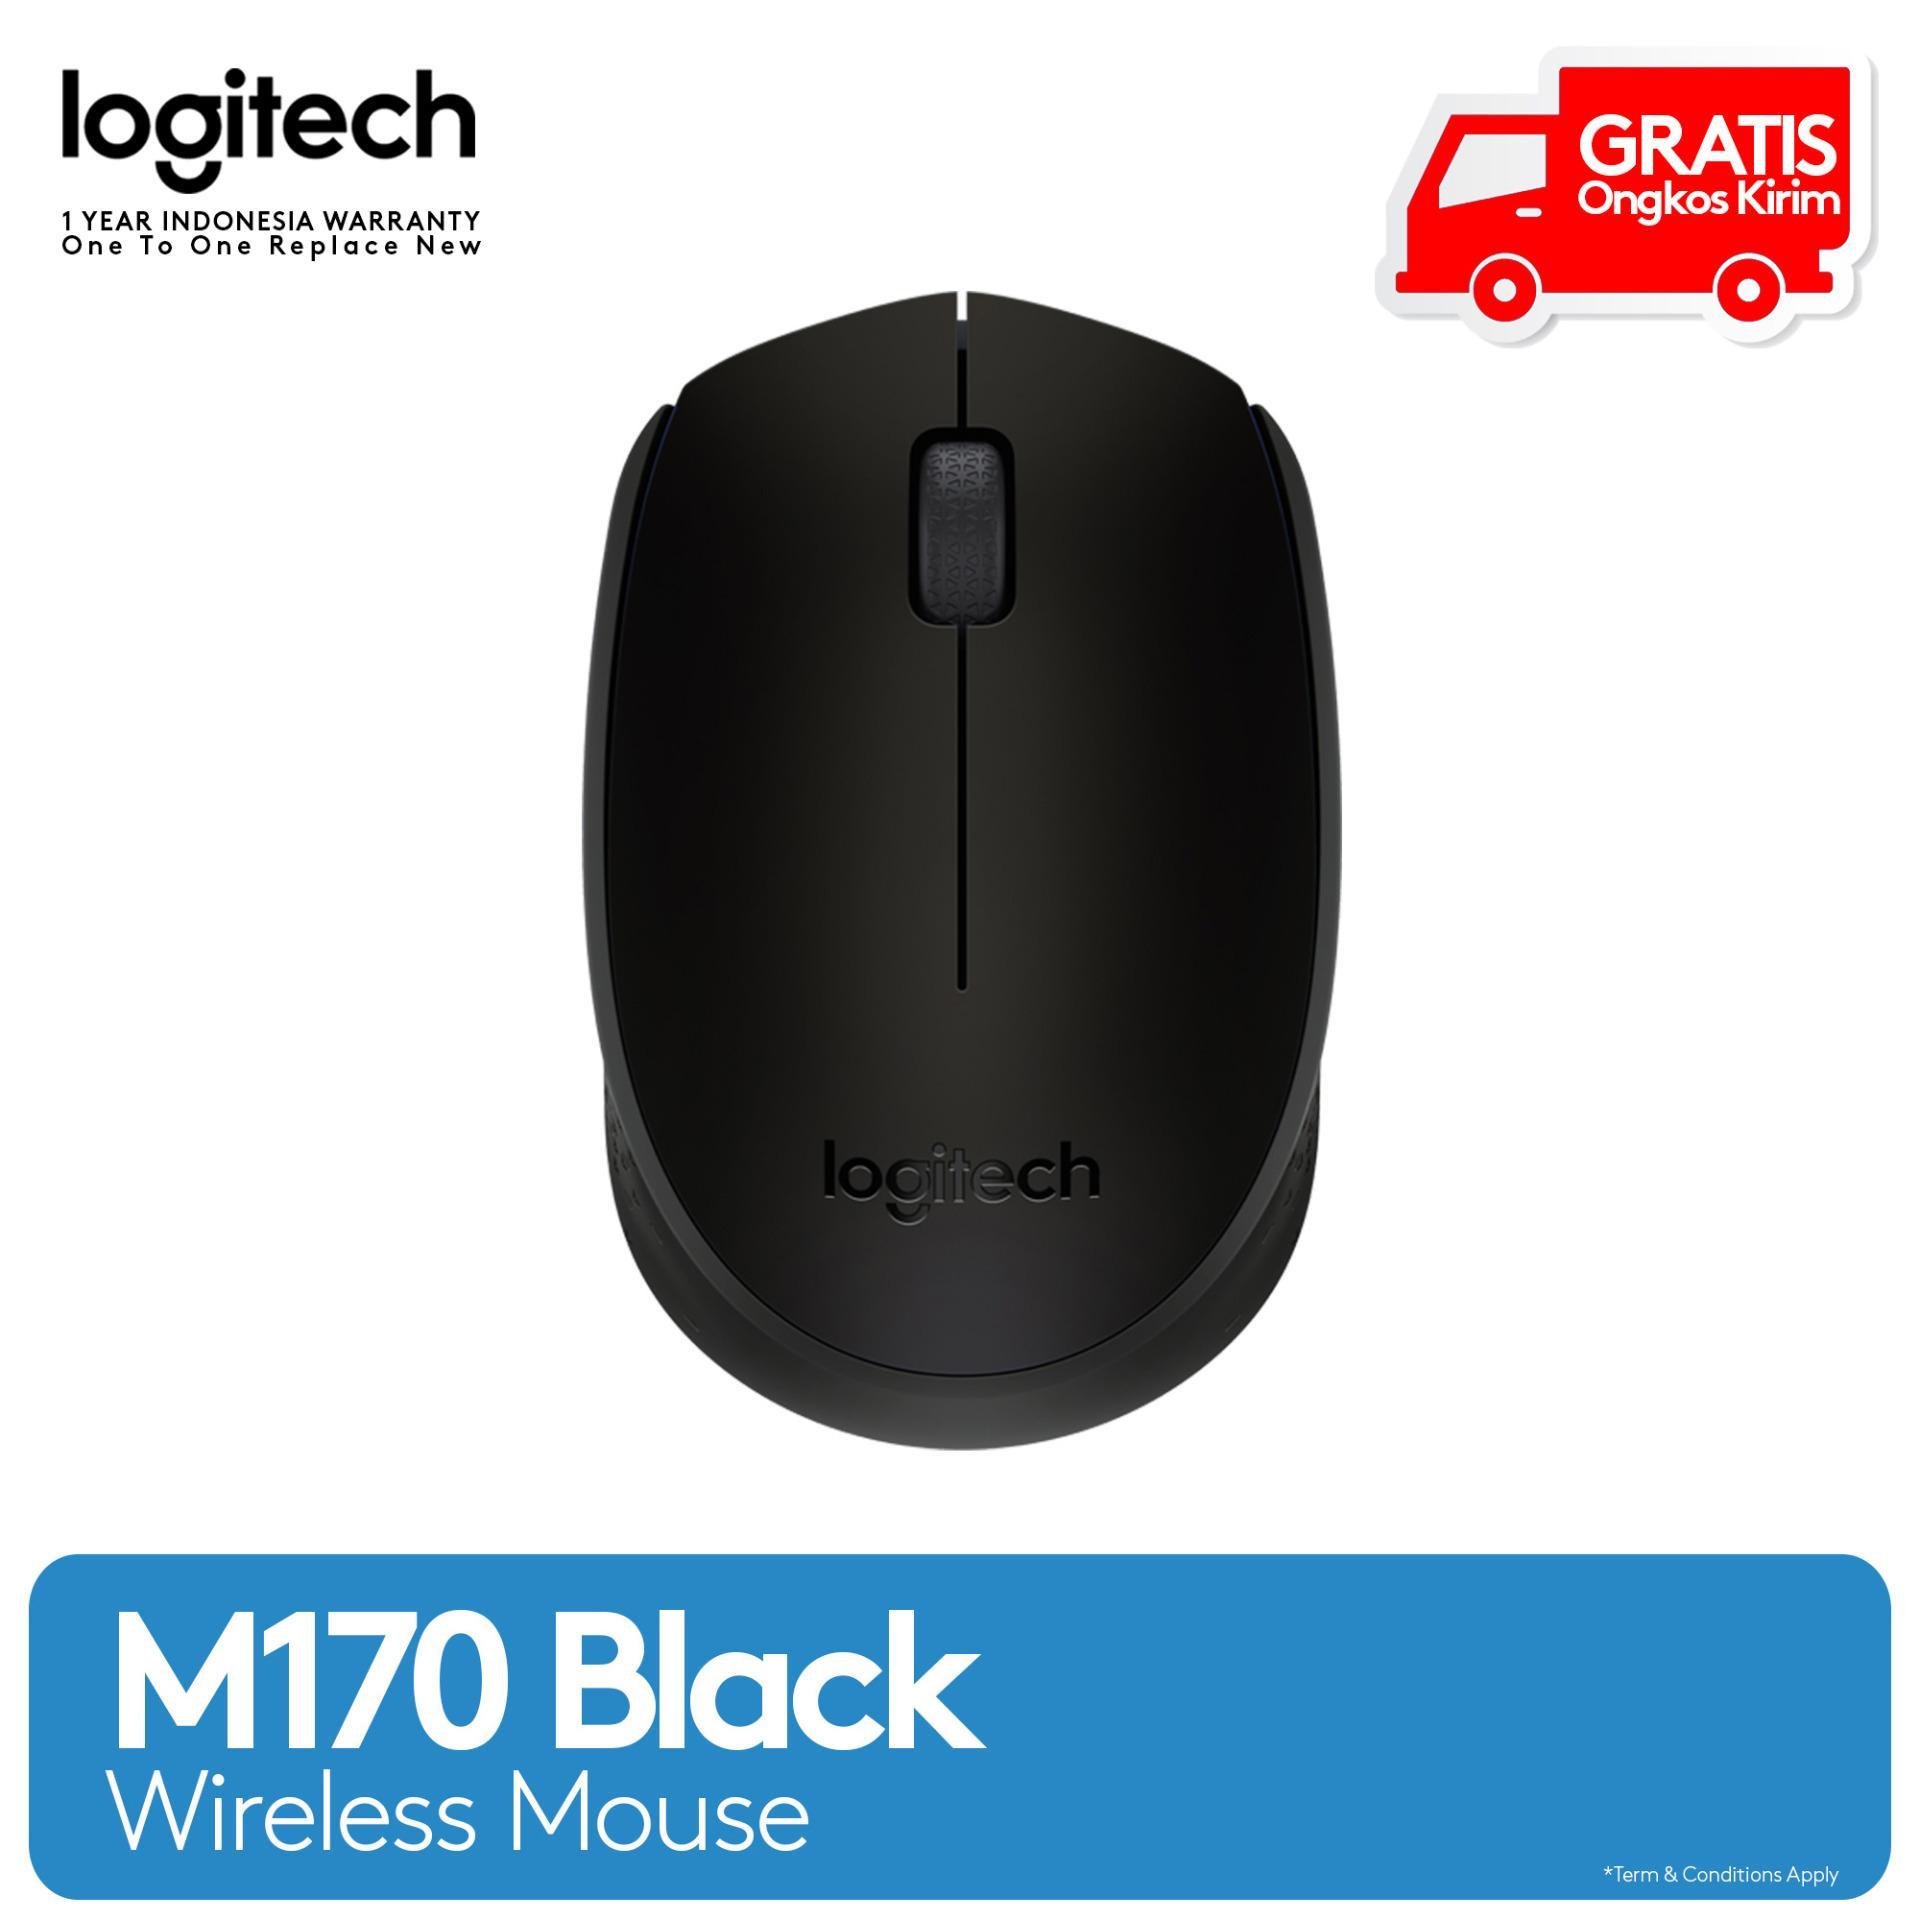 Logitech M170 Wireless Mouse - Hitam